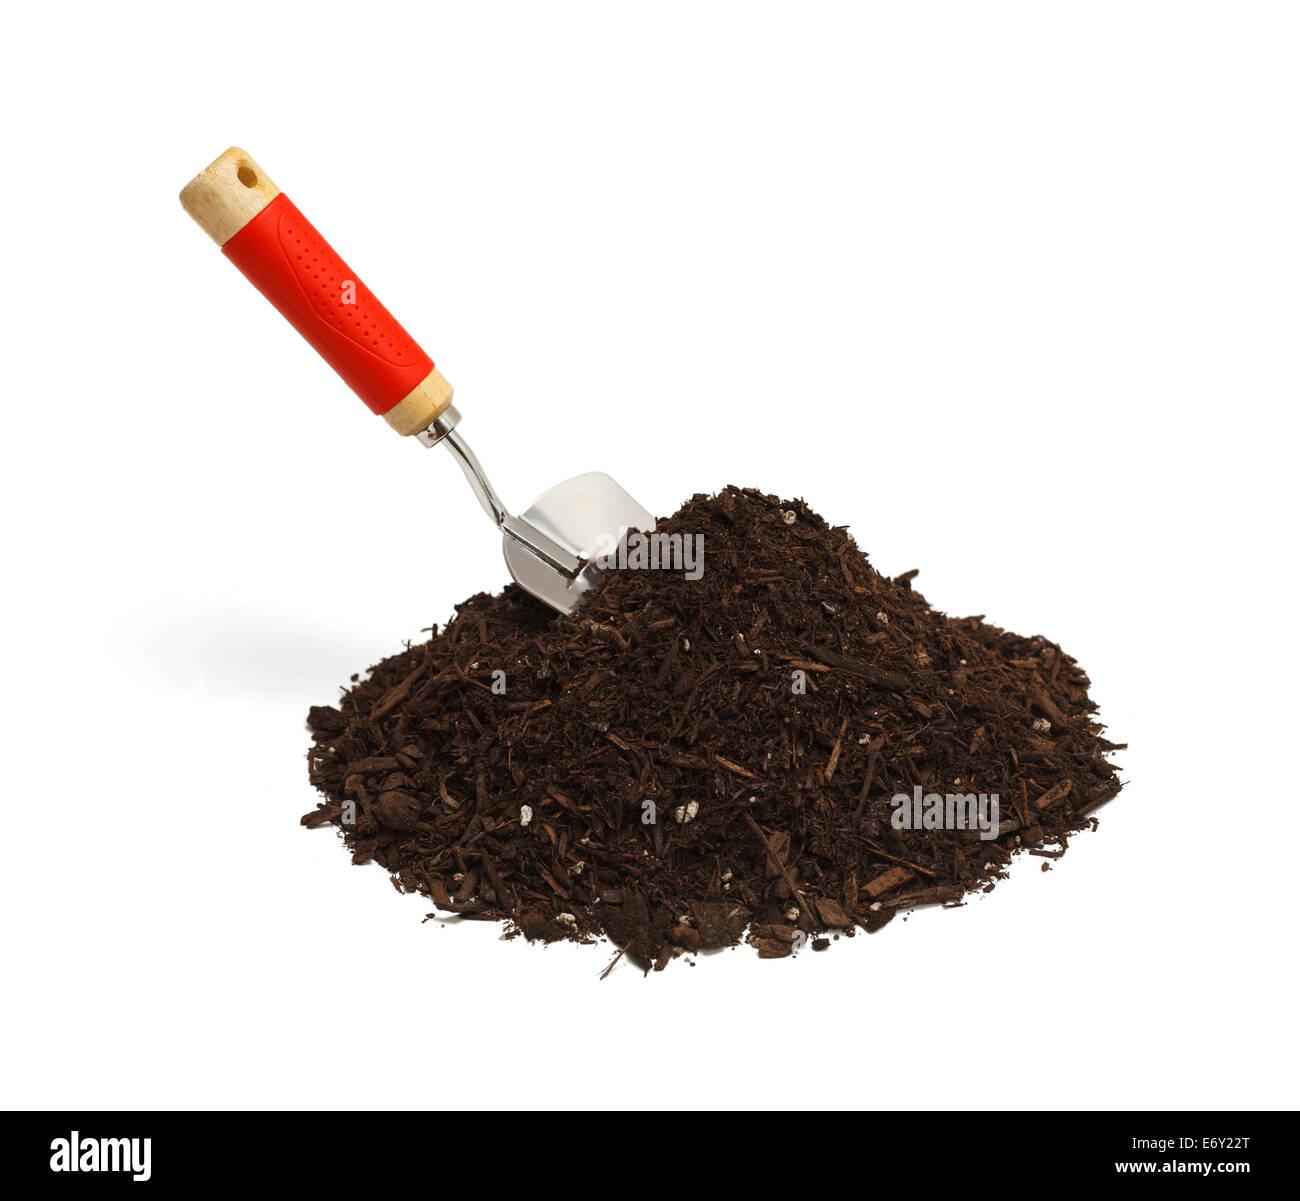 Garden Soil with Hand Shovel Isolated on White Background. - Stock Image